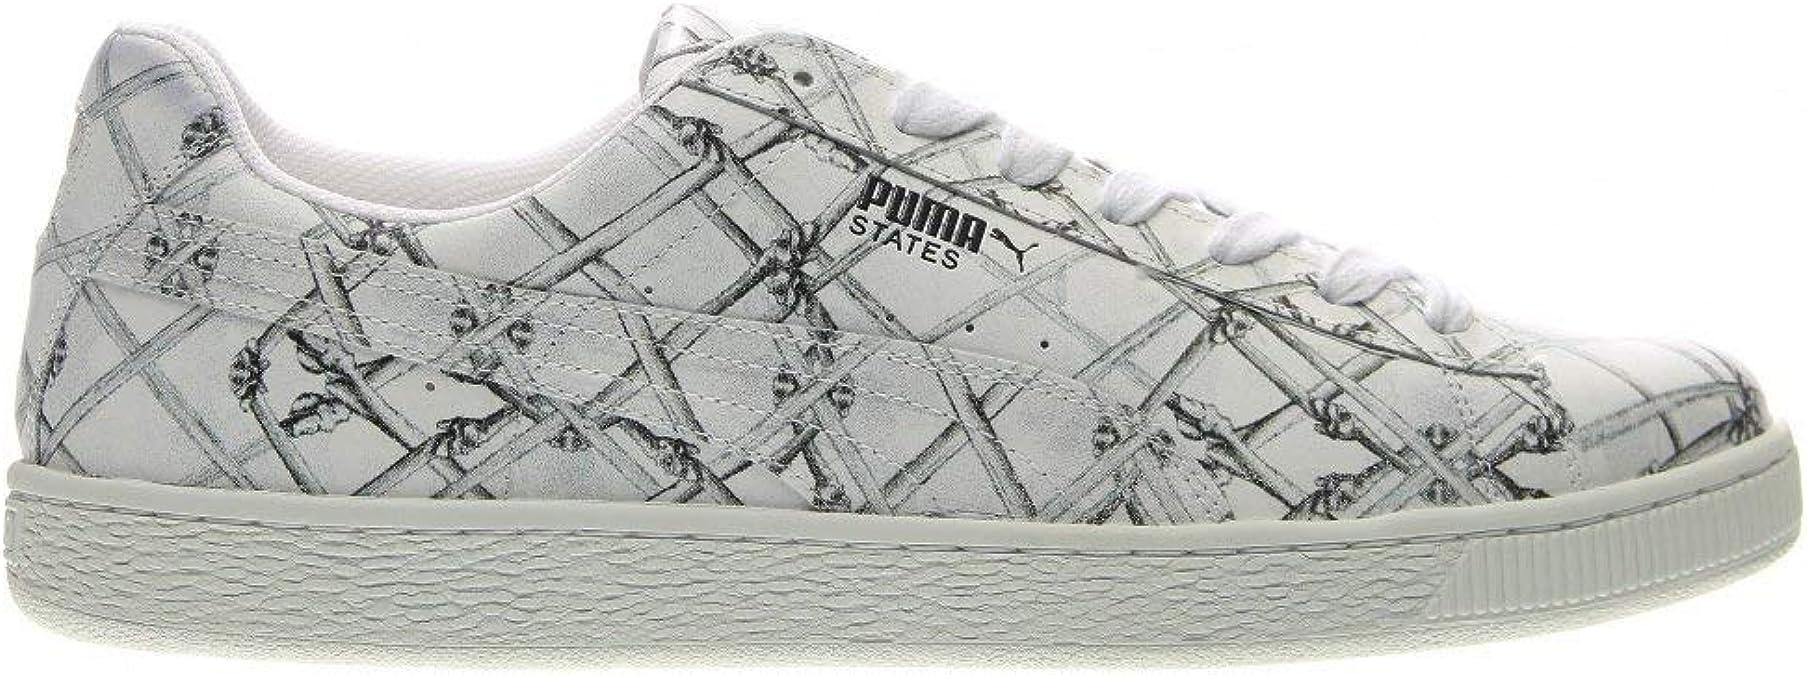 Puma States X Swash Bones Uomo US 9.5 Bianco Scarpe